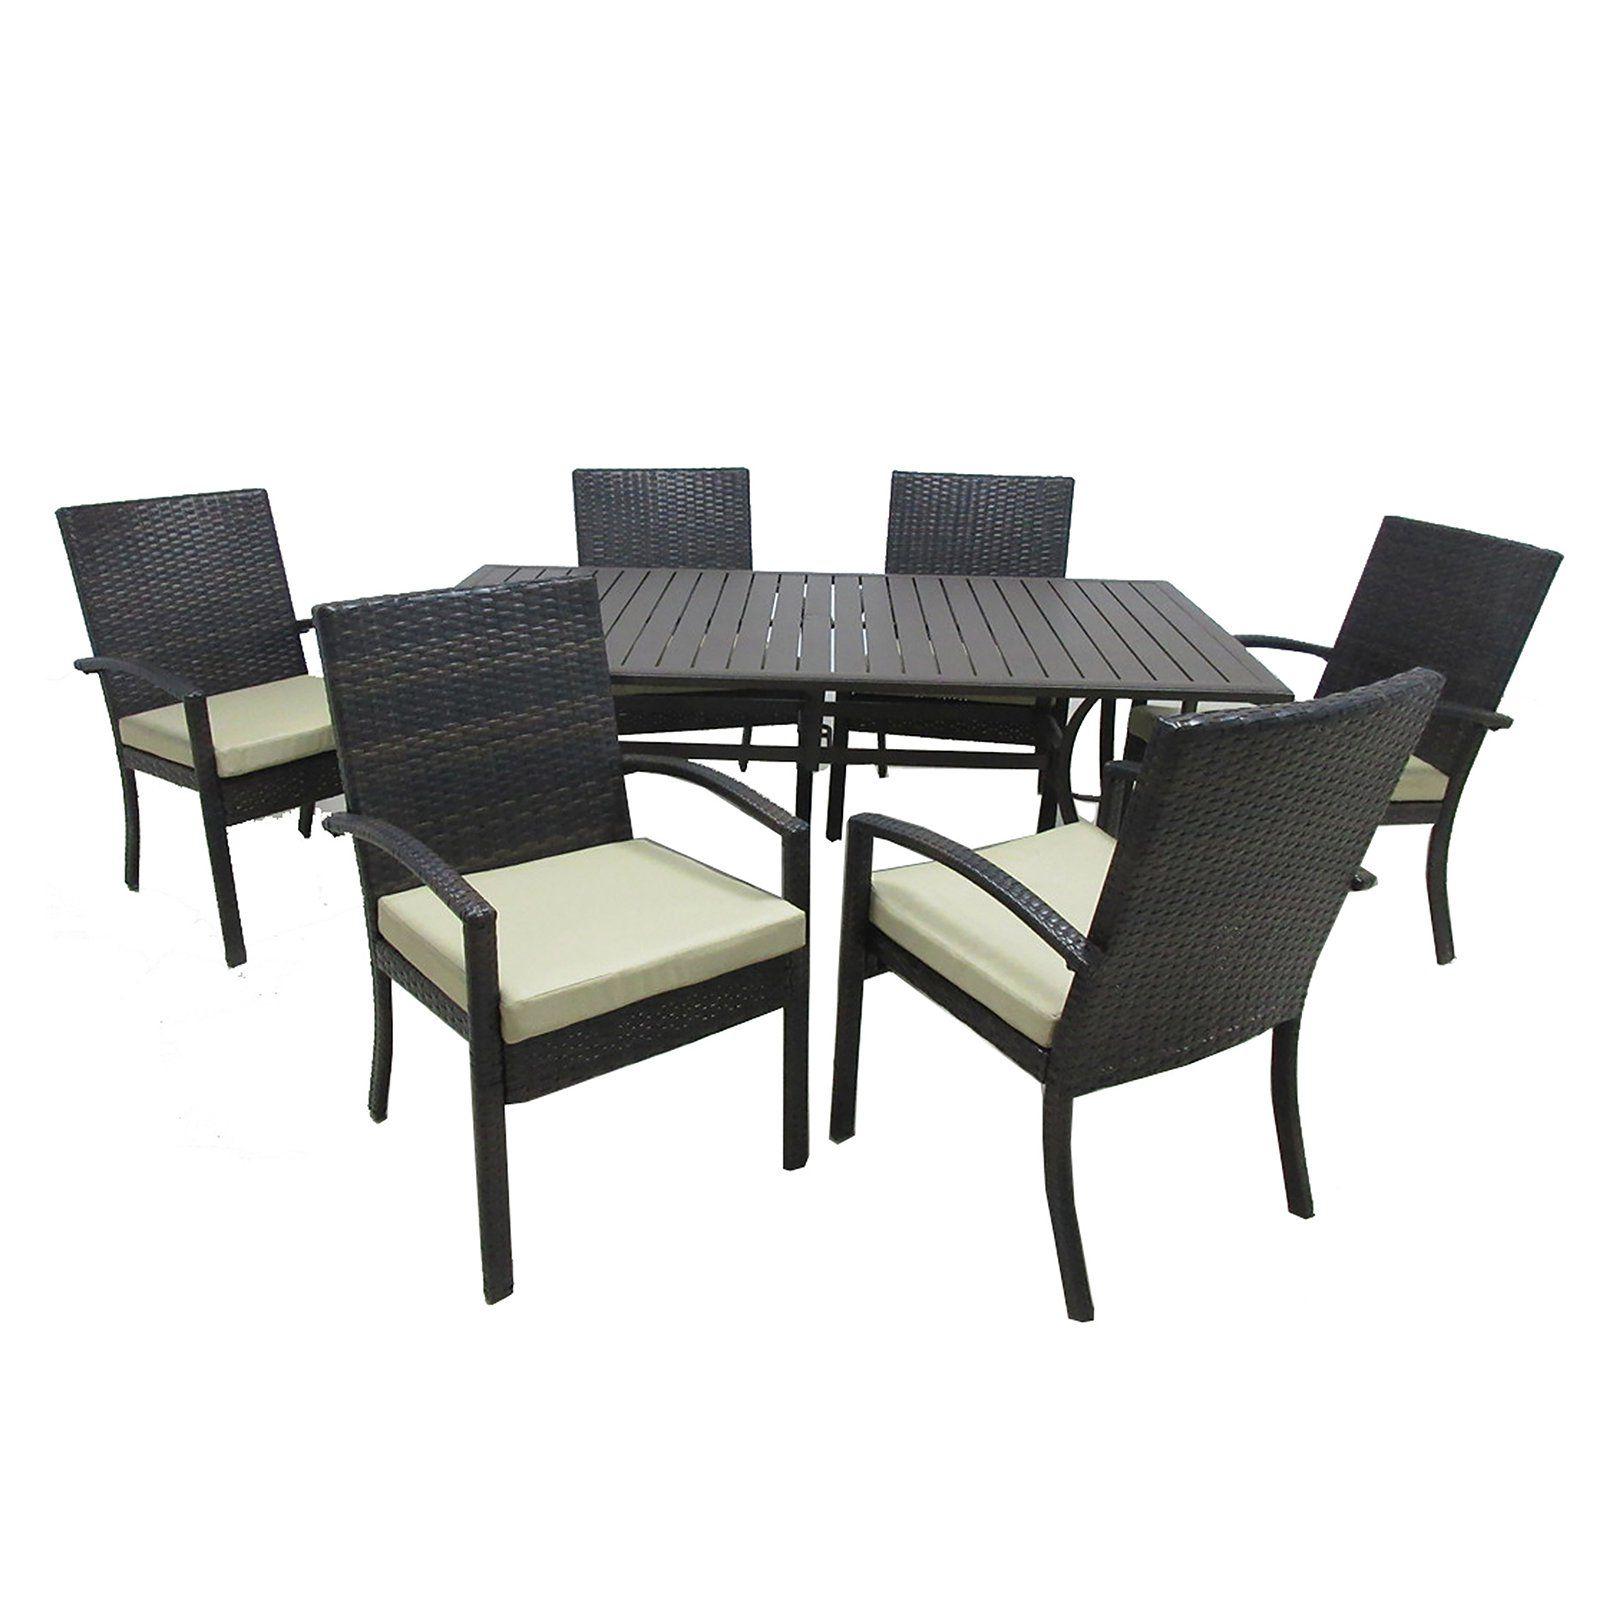 Outdoor Innovation Chelsea Aluminum 7 Piece Rectangle Patio Dining Set 7040s 6d